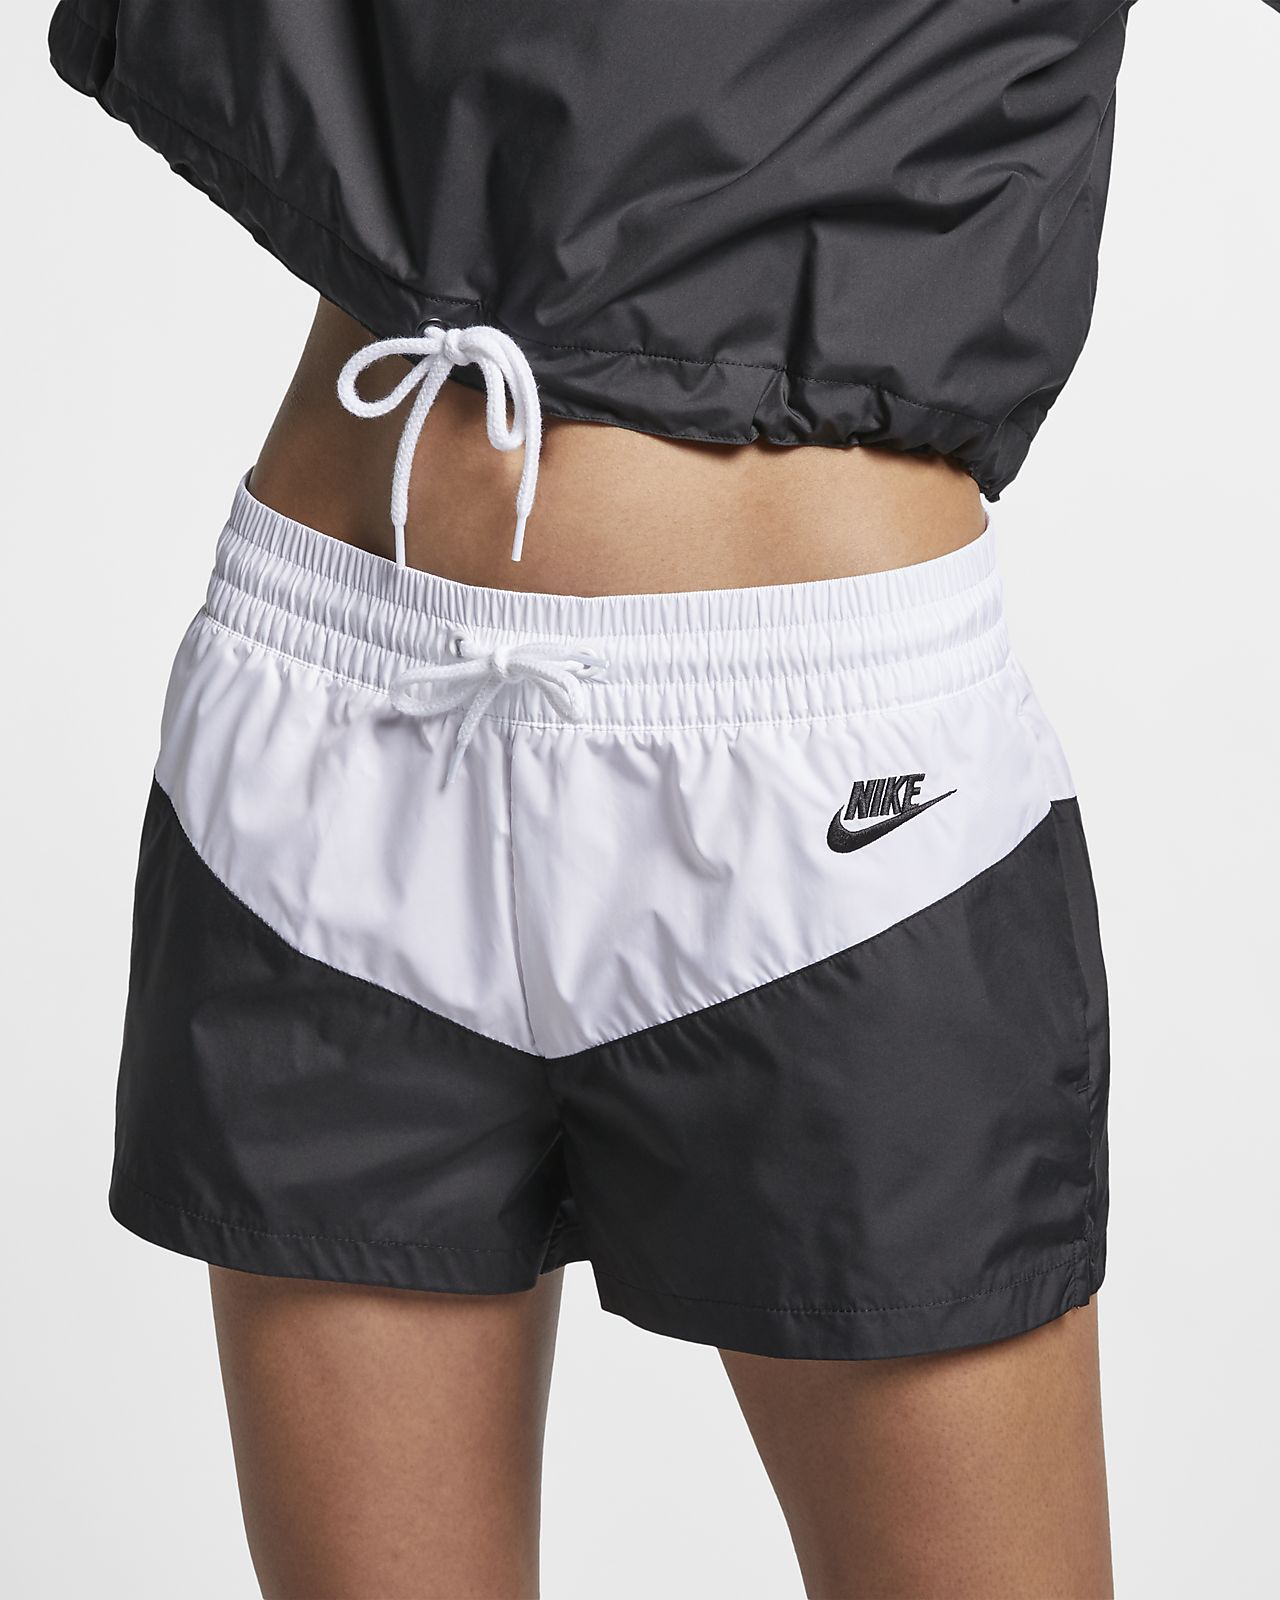 Shorts in woven Nike Sportswear Heritage - Donna